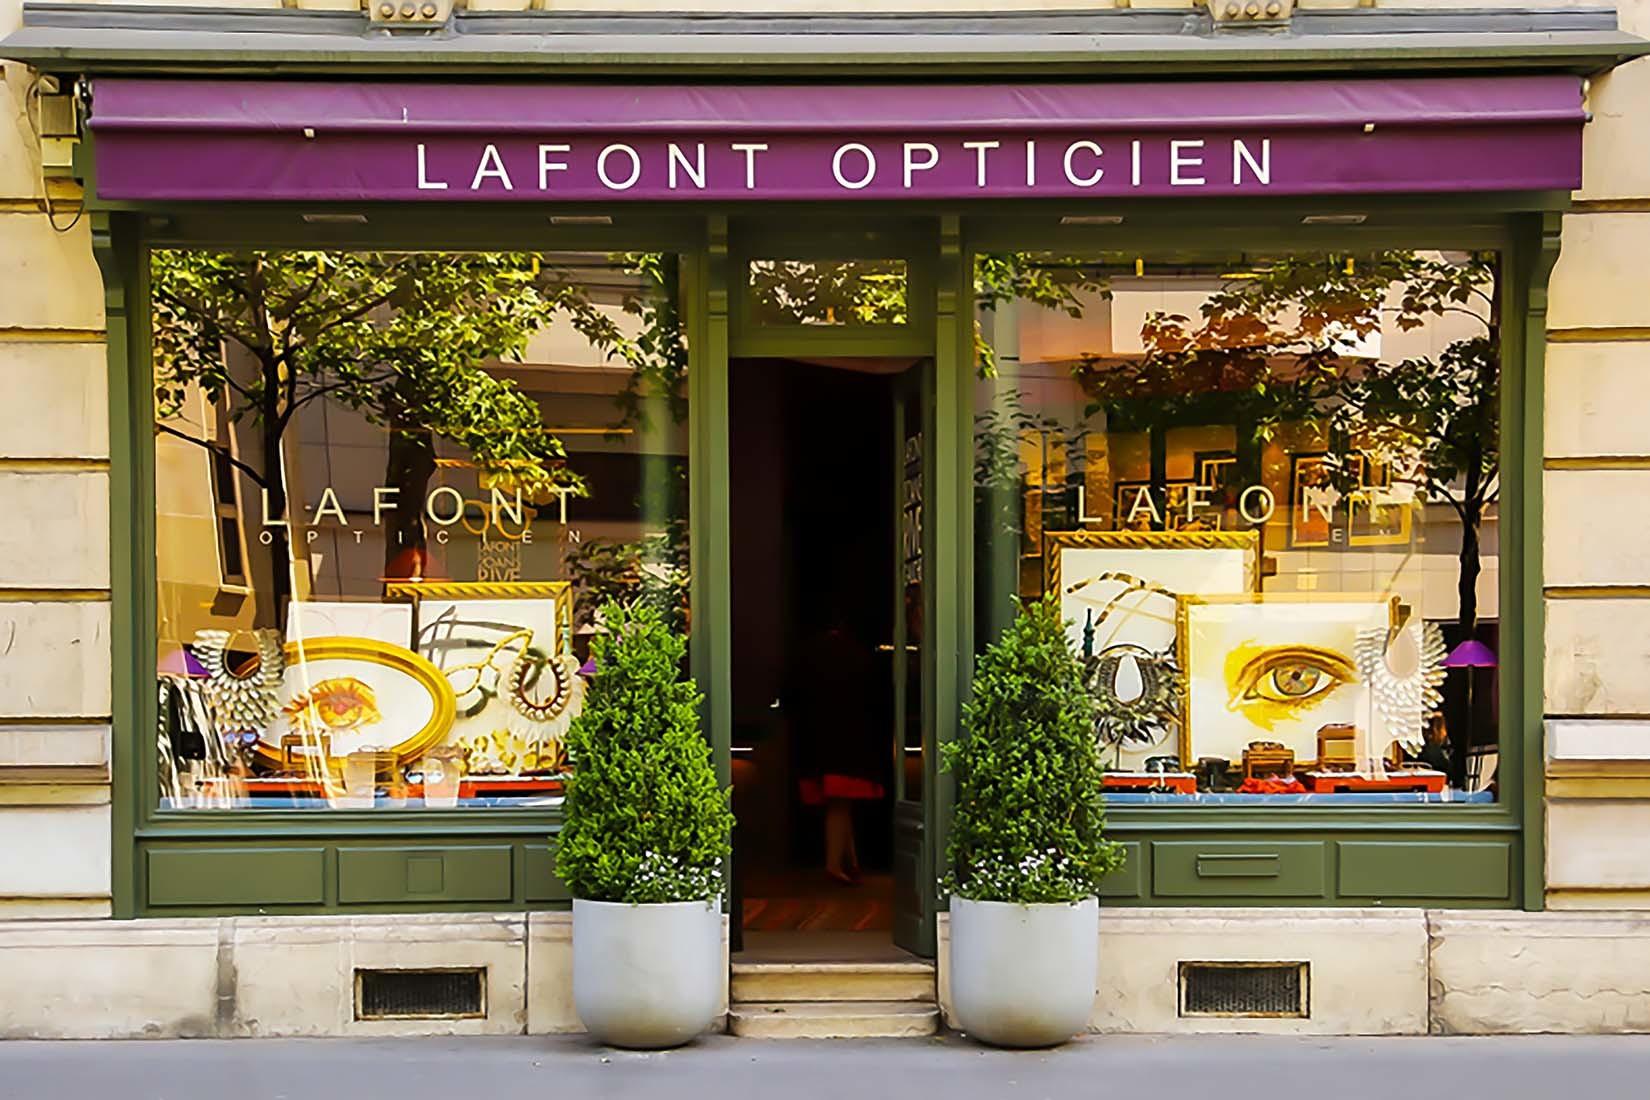 Lafont eyeglasses in Singapore